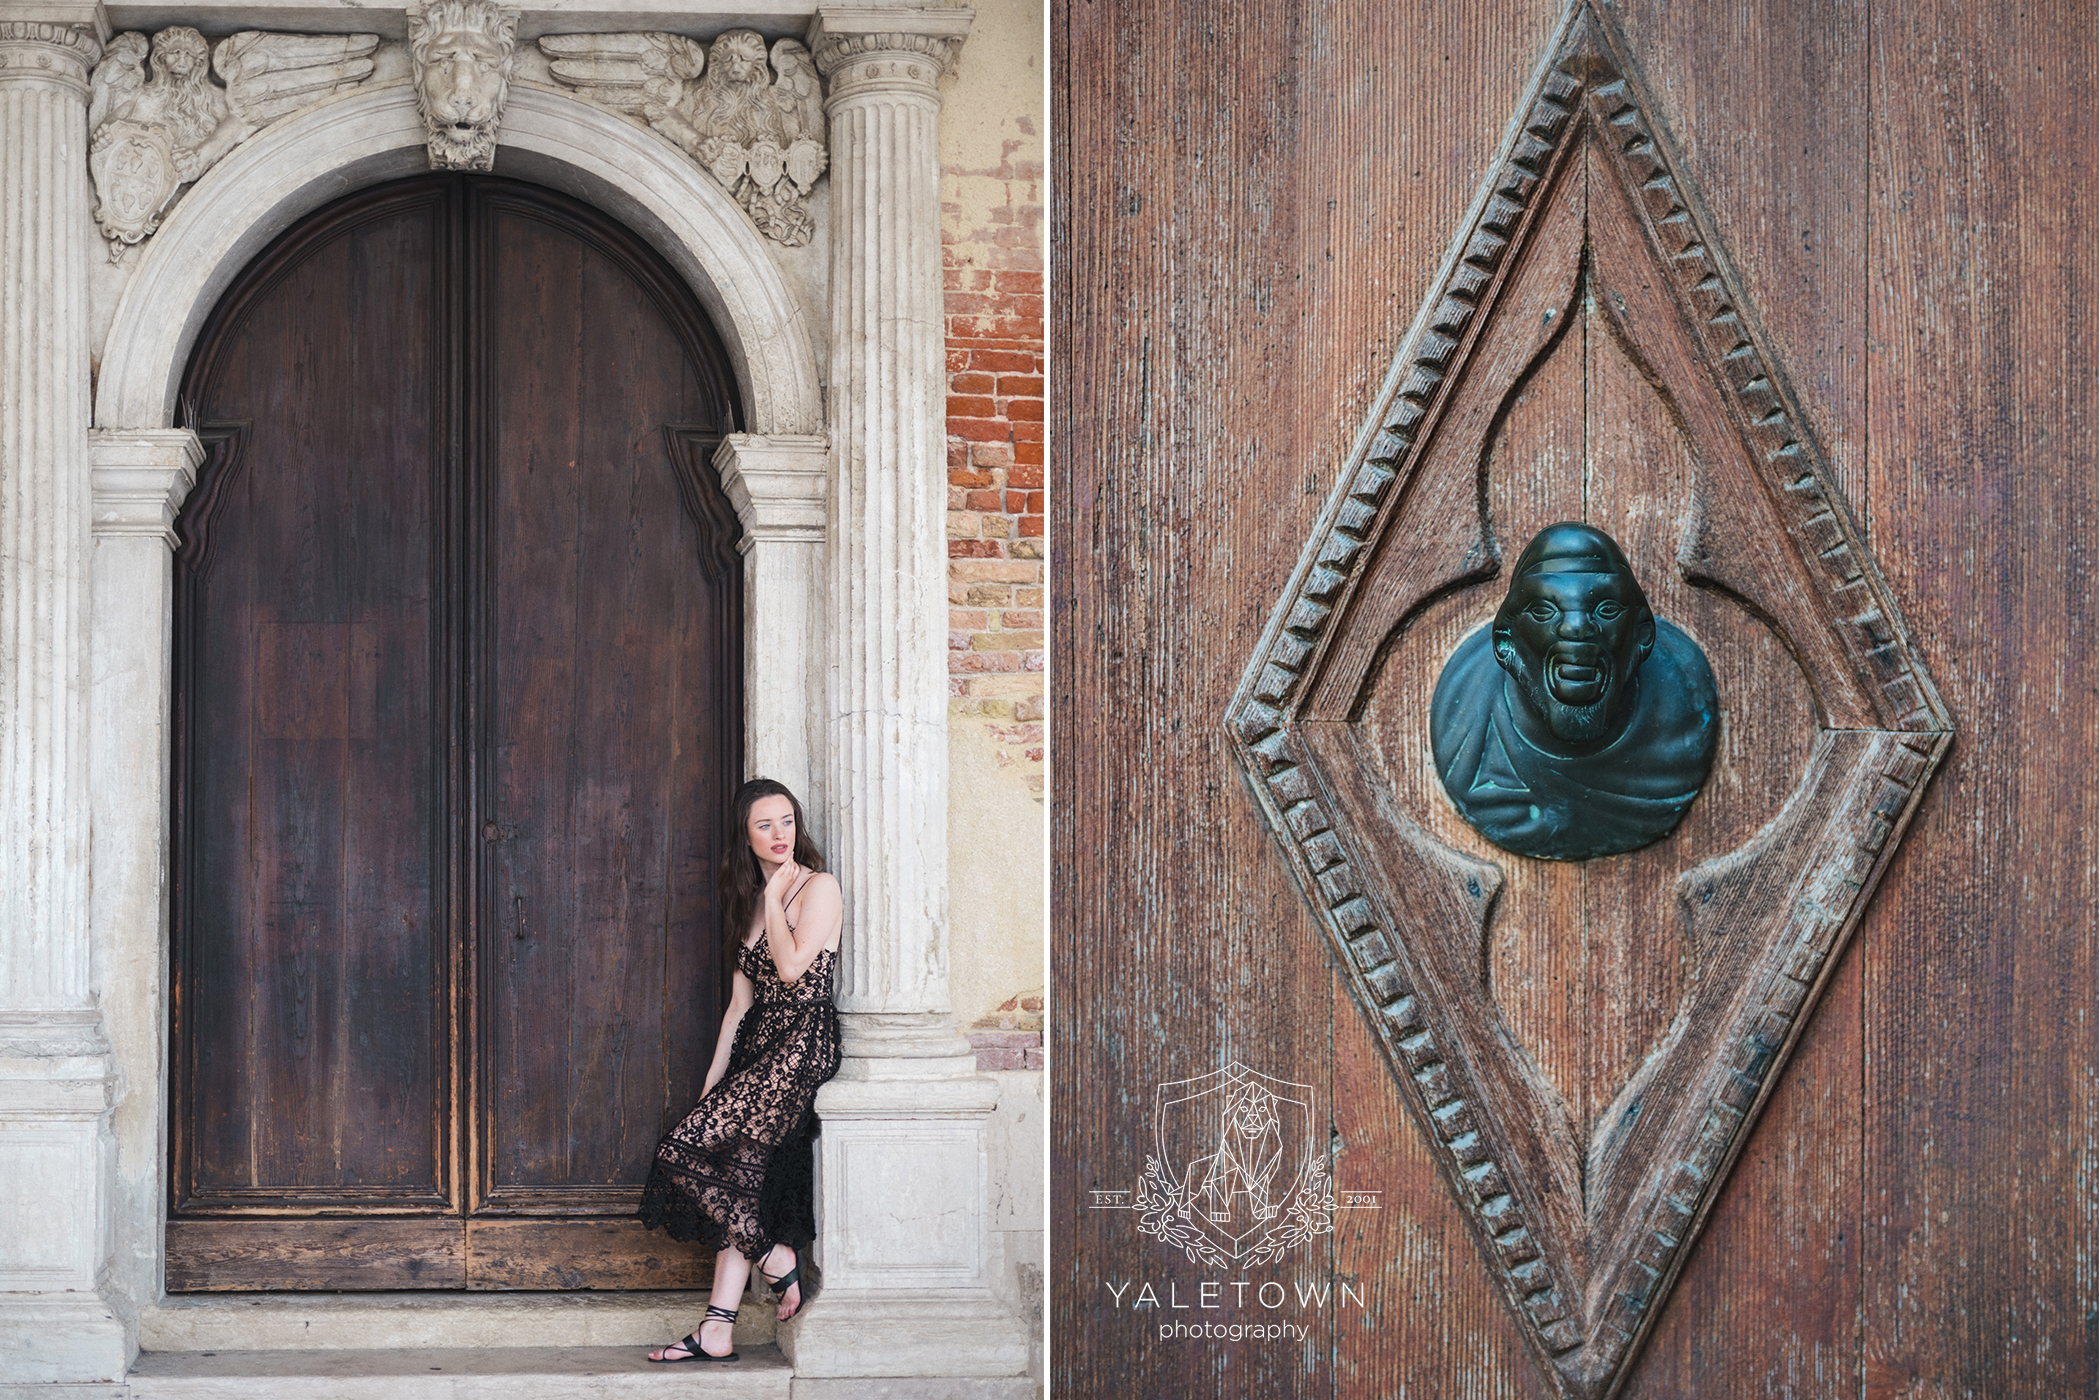 Venice-portrait-session-yaletown-photography-vacation-photographer-photo-012.jpg